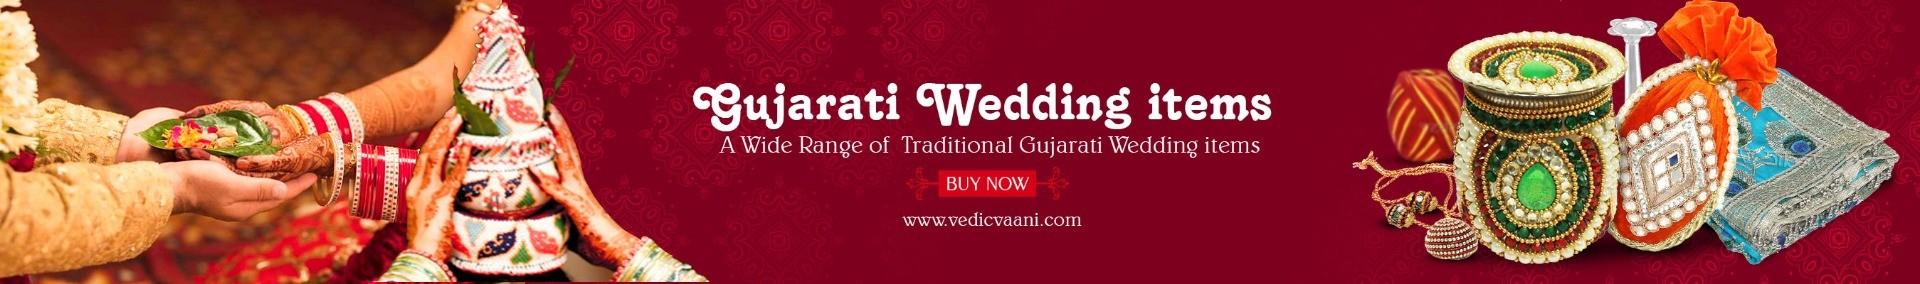 Gujarati Wedding Items